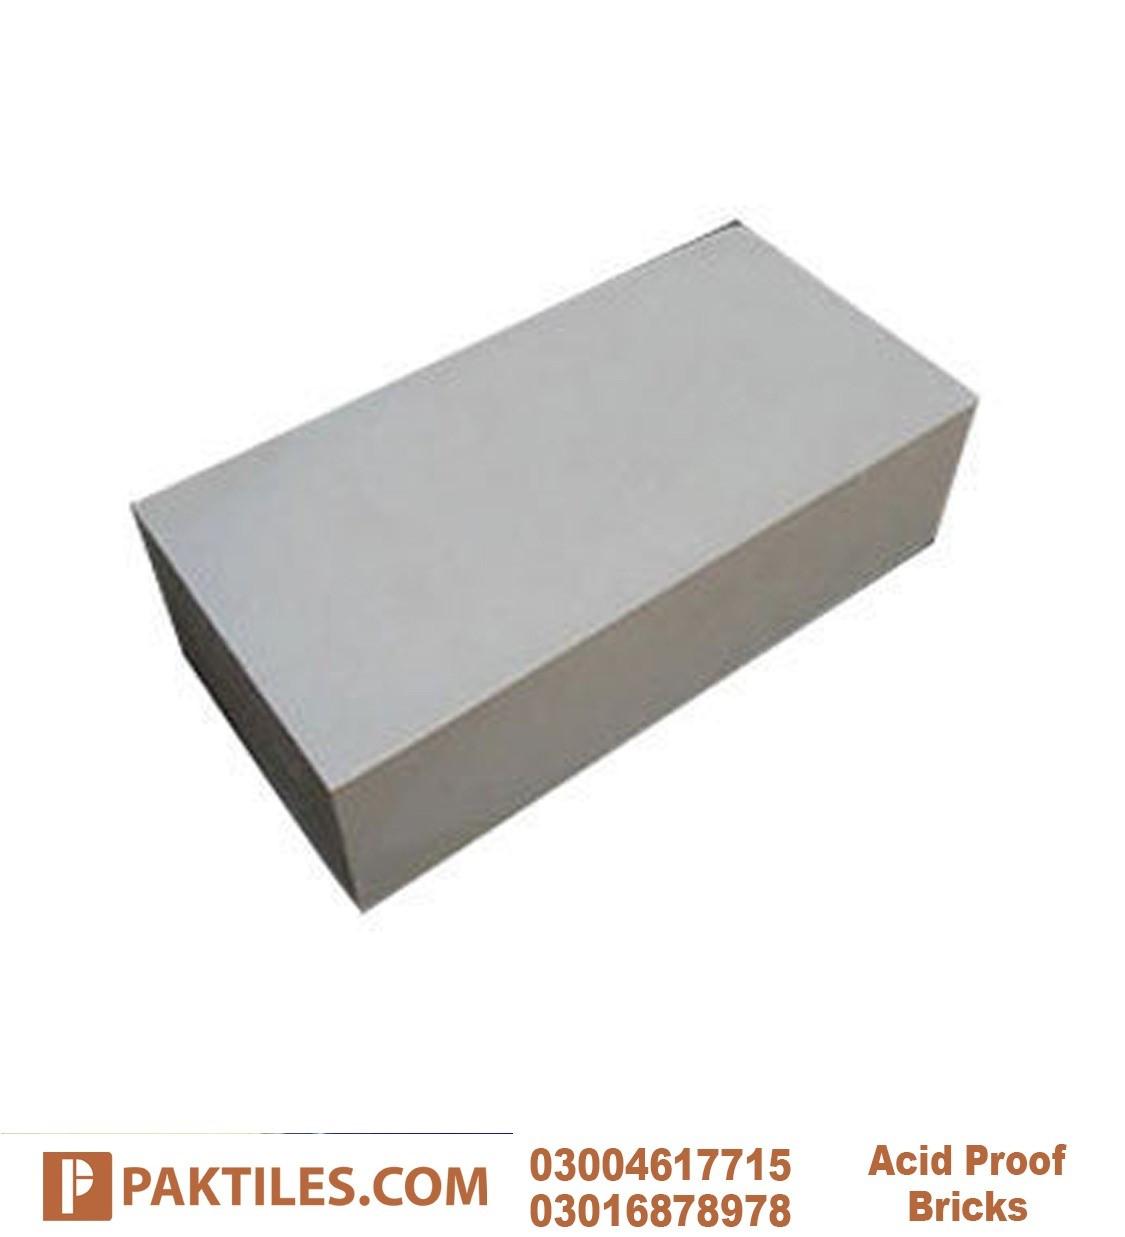 Acid resistant brick price in pakistan